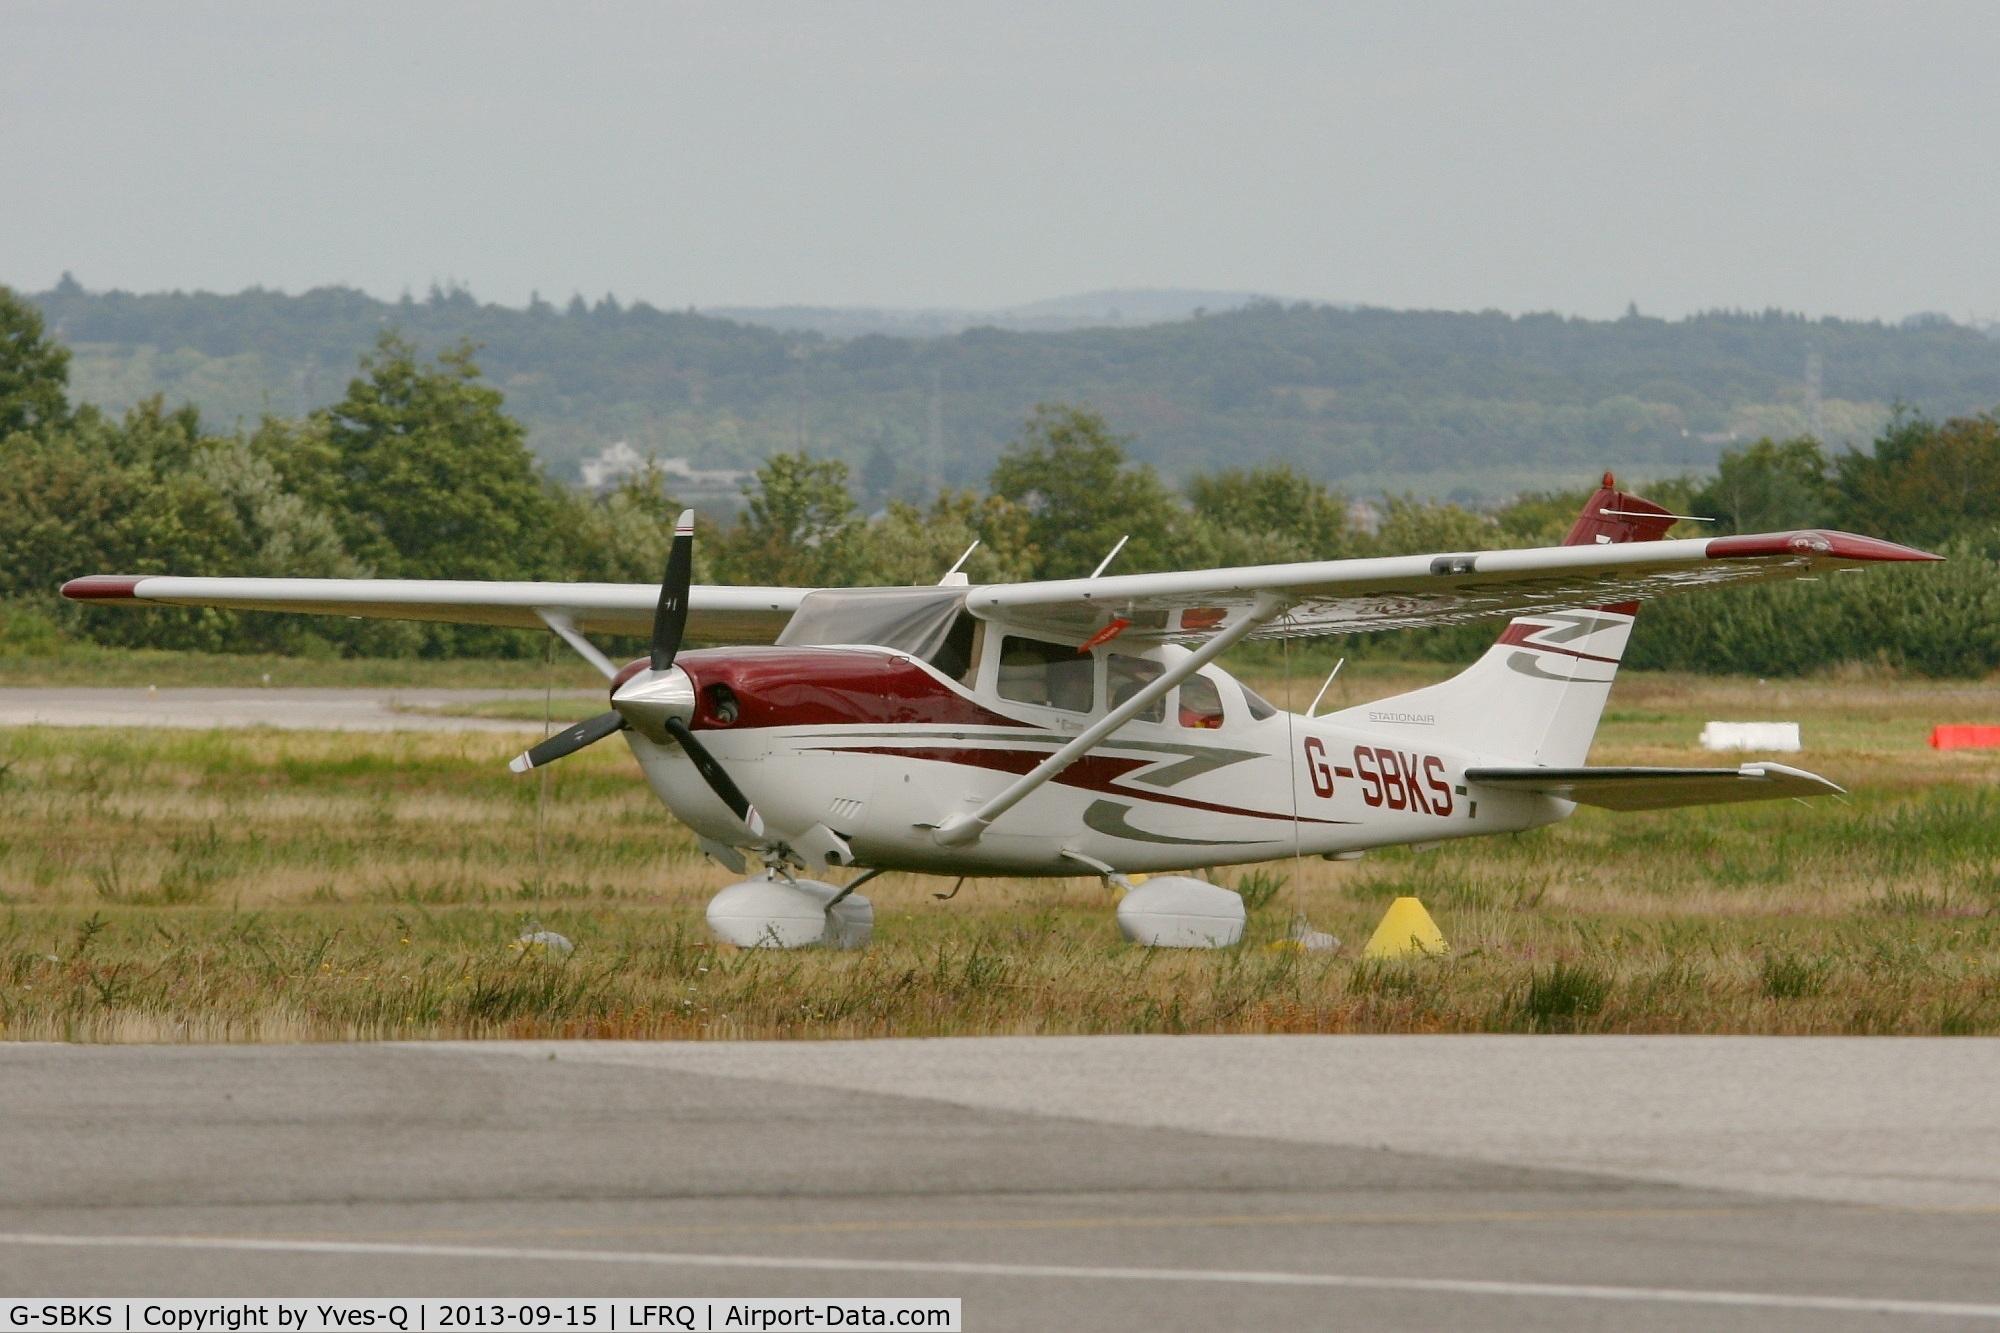 G-SBKS, 2007 Cessna 206H Stationair C/N 206-08290, Cessna 206H Stationair, Quimper-Cornouaille Airport (LFRQ-UIP)